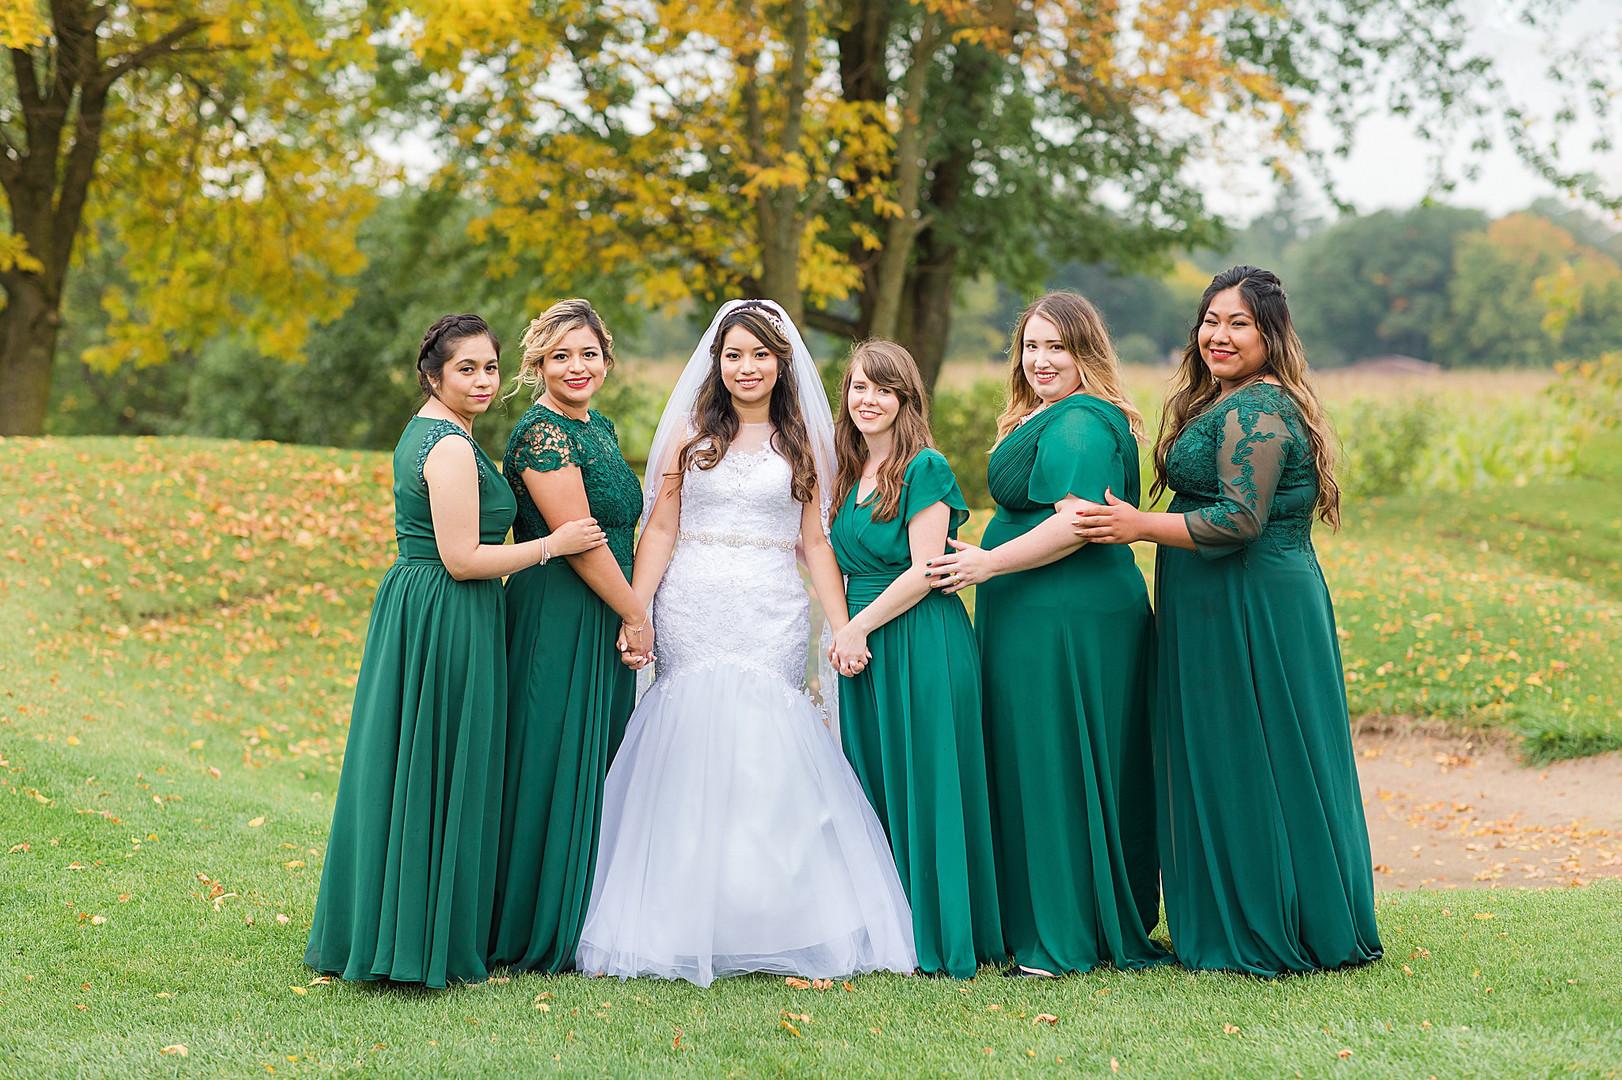 msxphotos-bjr-wedding-305.jpg